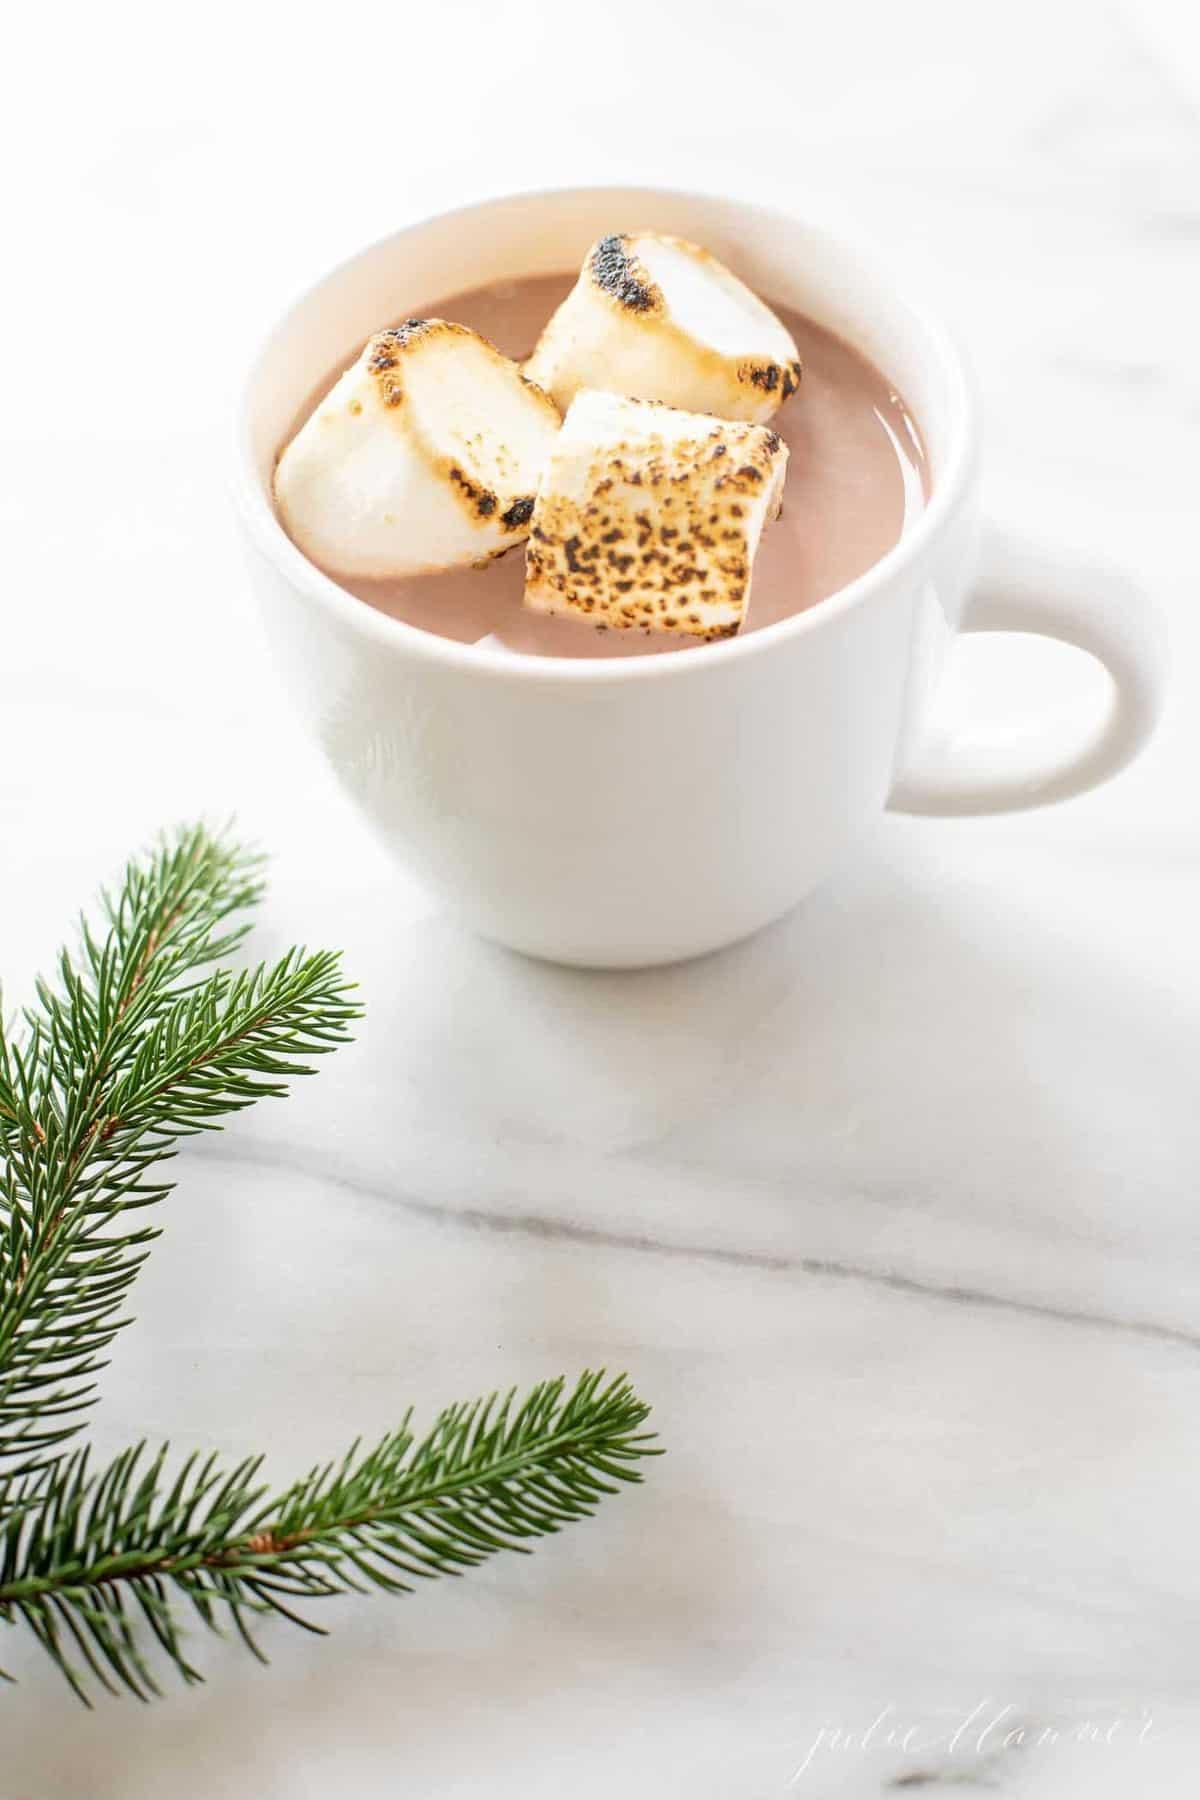 A single mug of spiked hot chocolate, greenery to the side.